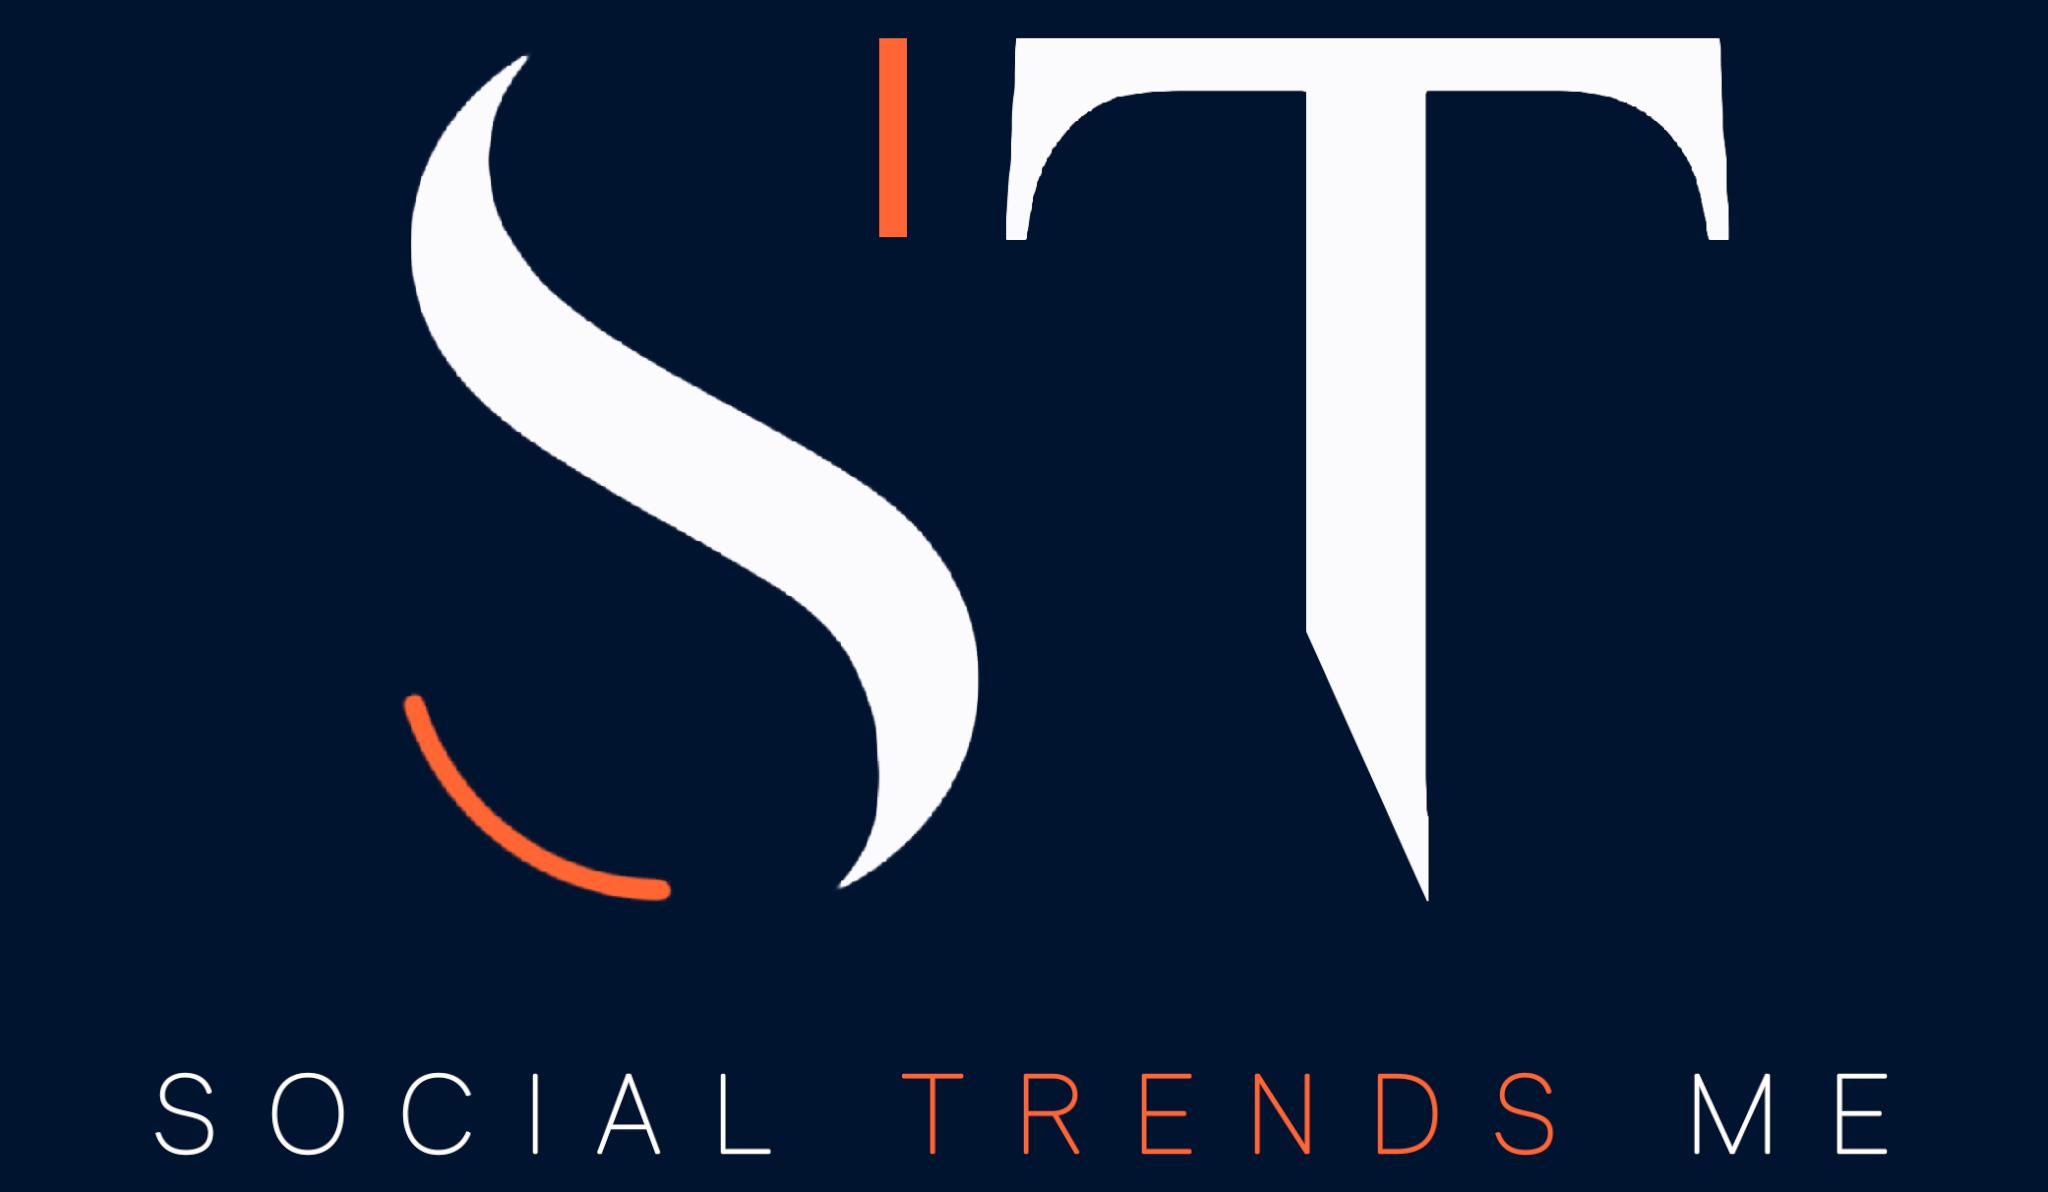 Social Trends ME